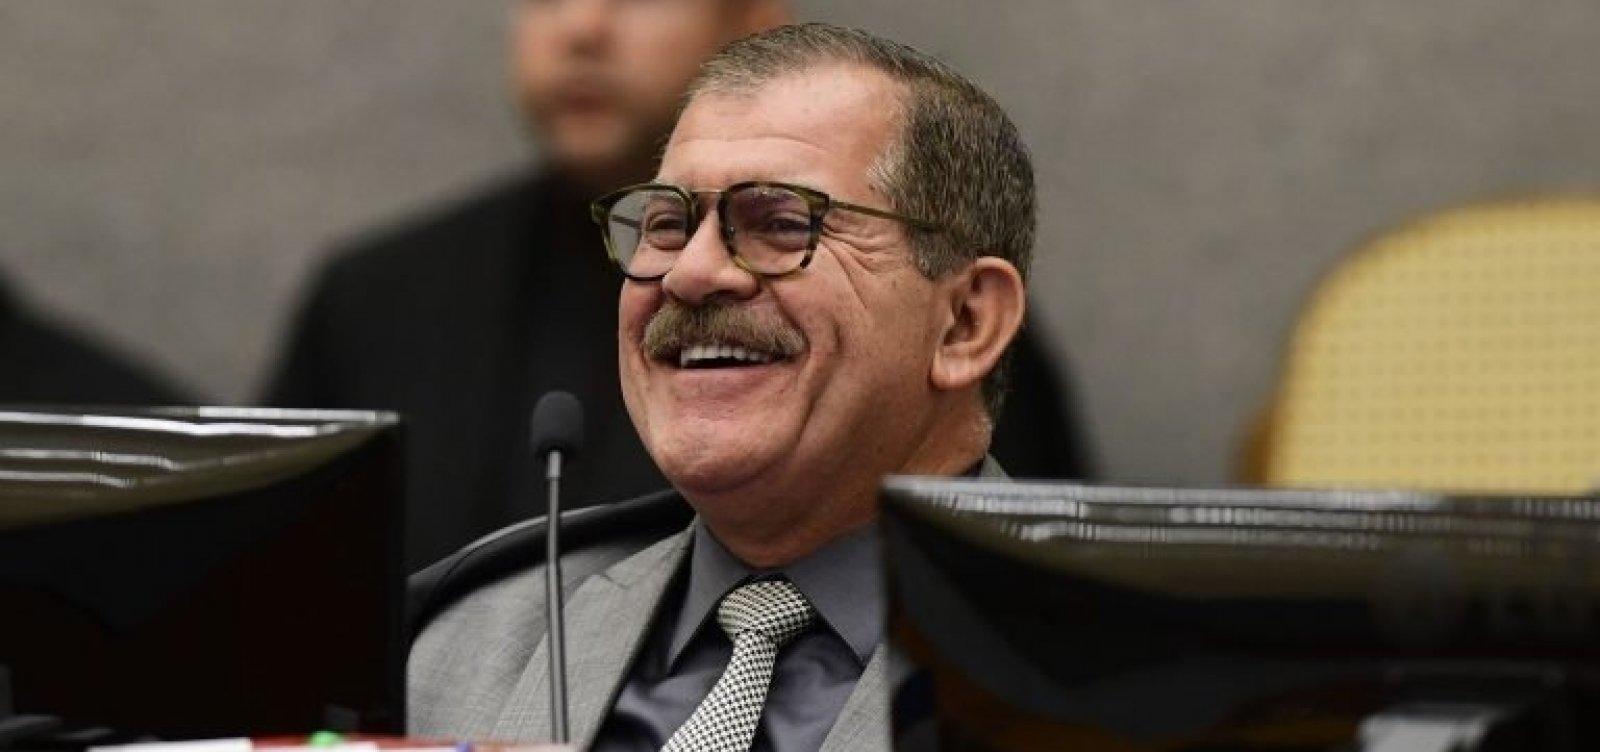 Conduta de Moro na Lava Jato será julgada pelo CNJ, diz corregedor Justiça